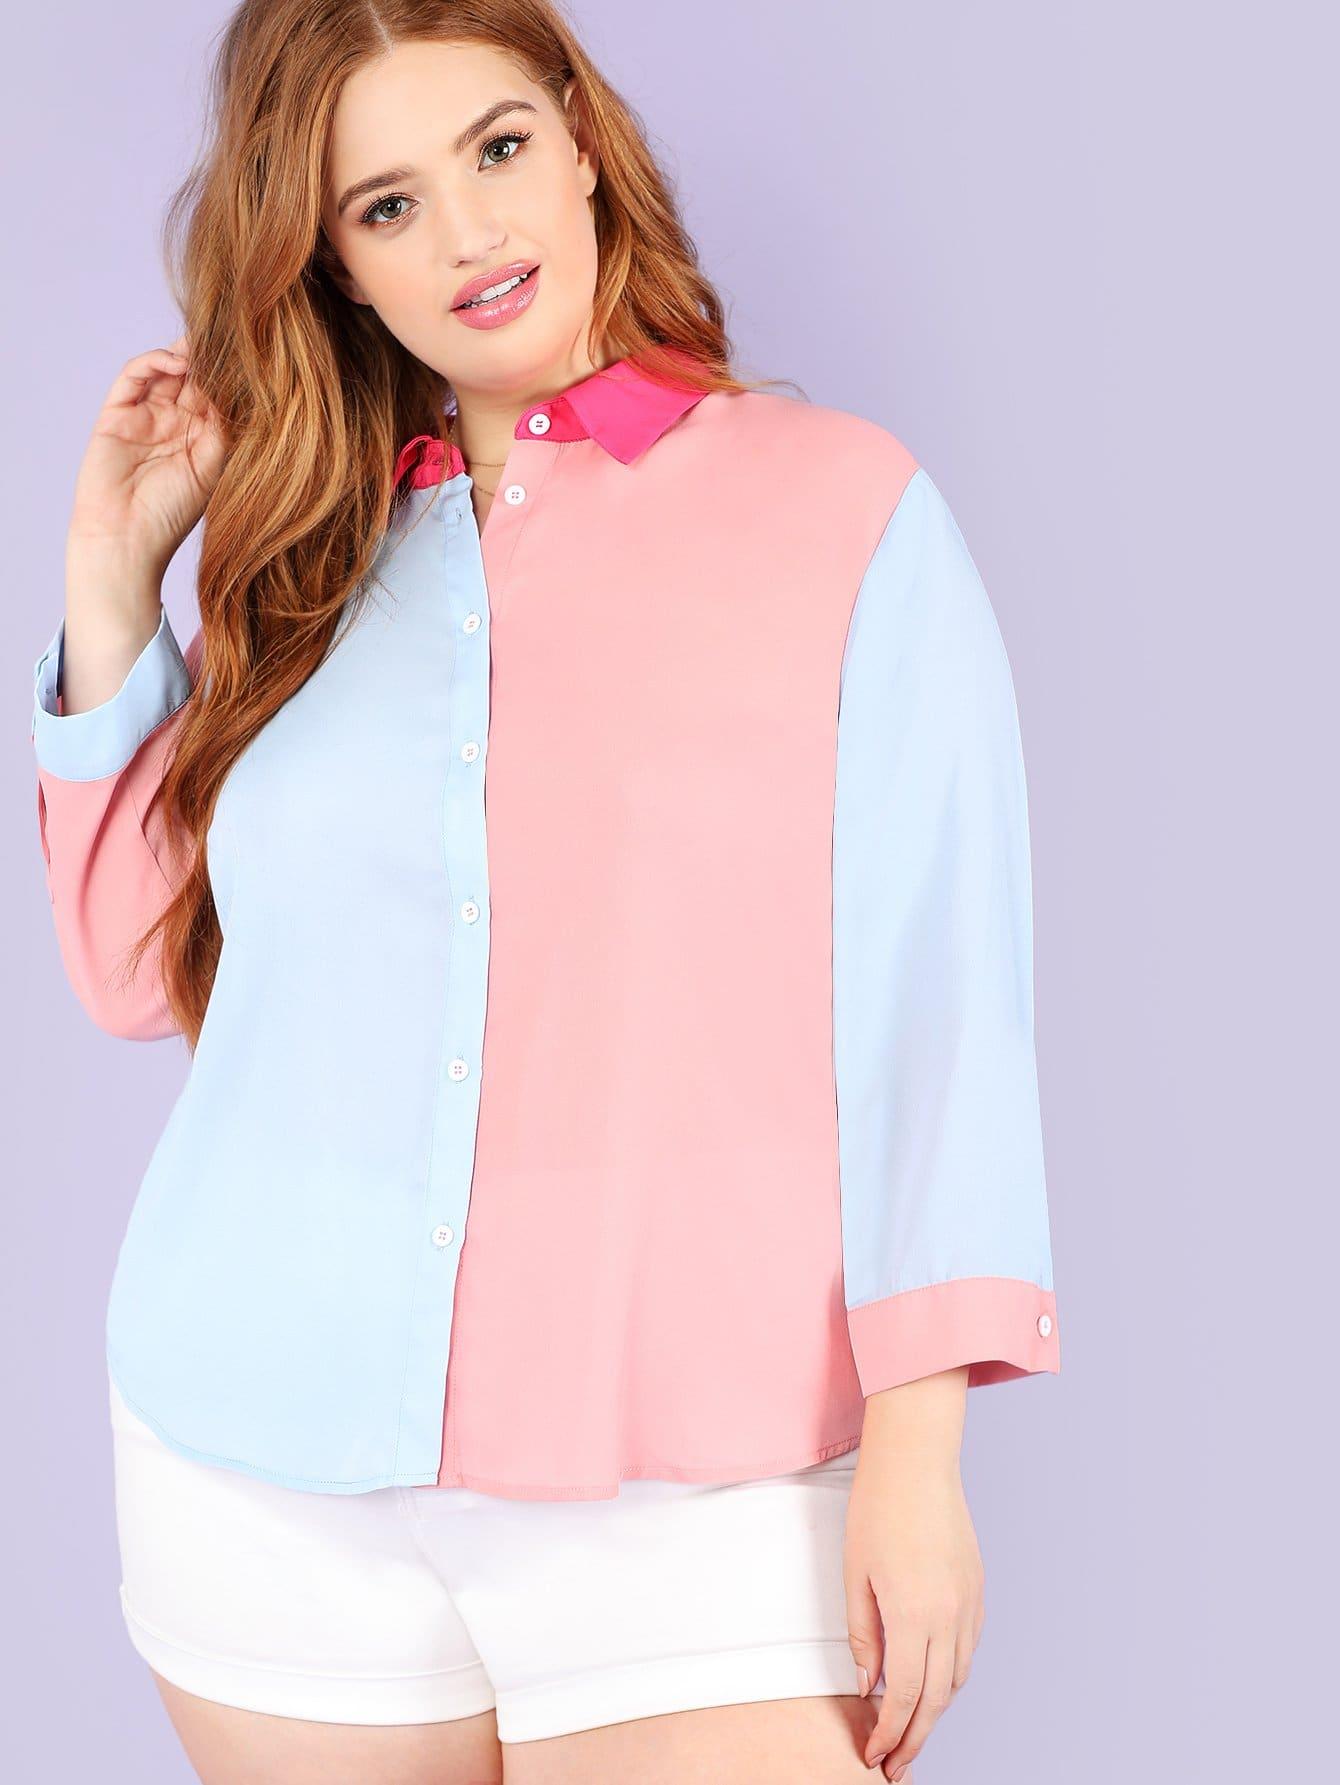 Купить Цветная блузка, Bree Kish, SheIn